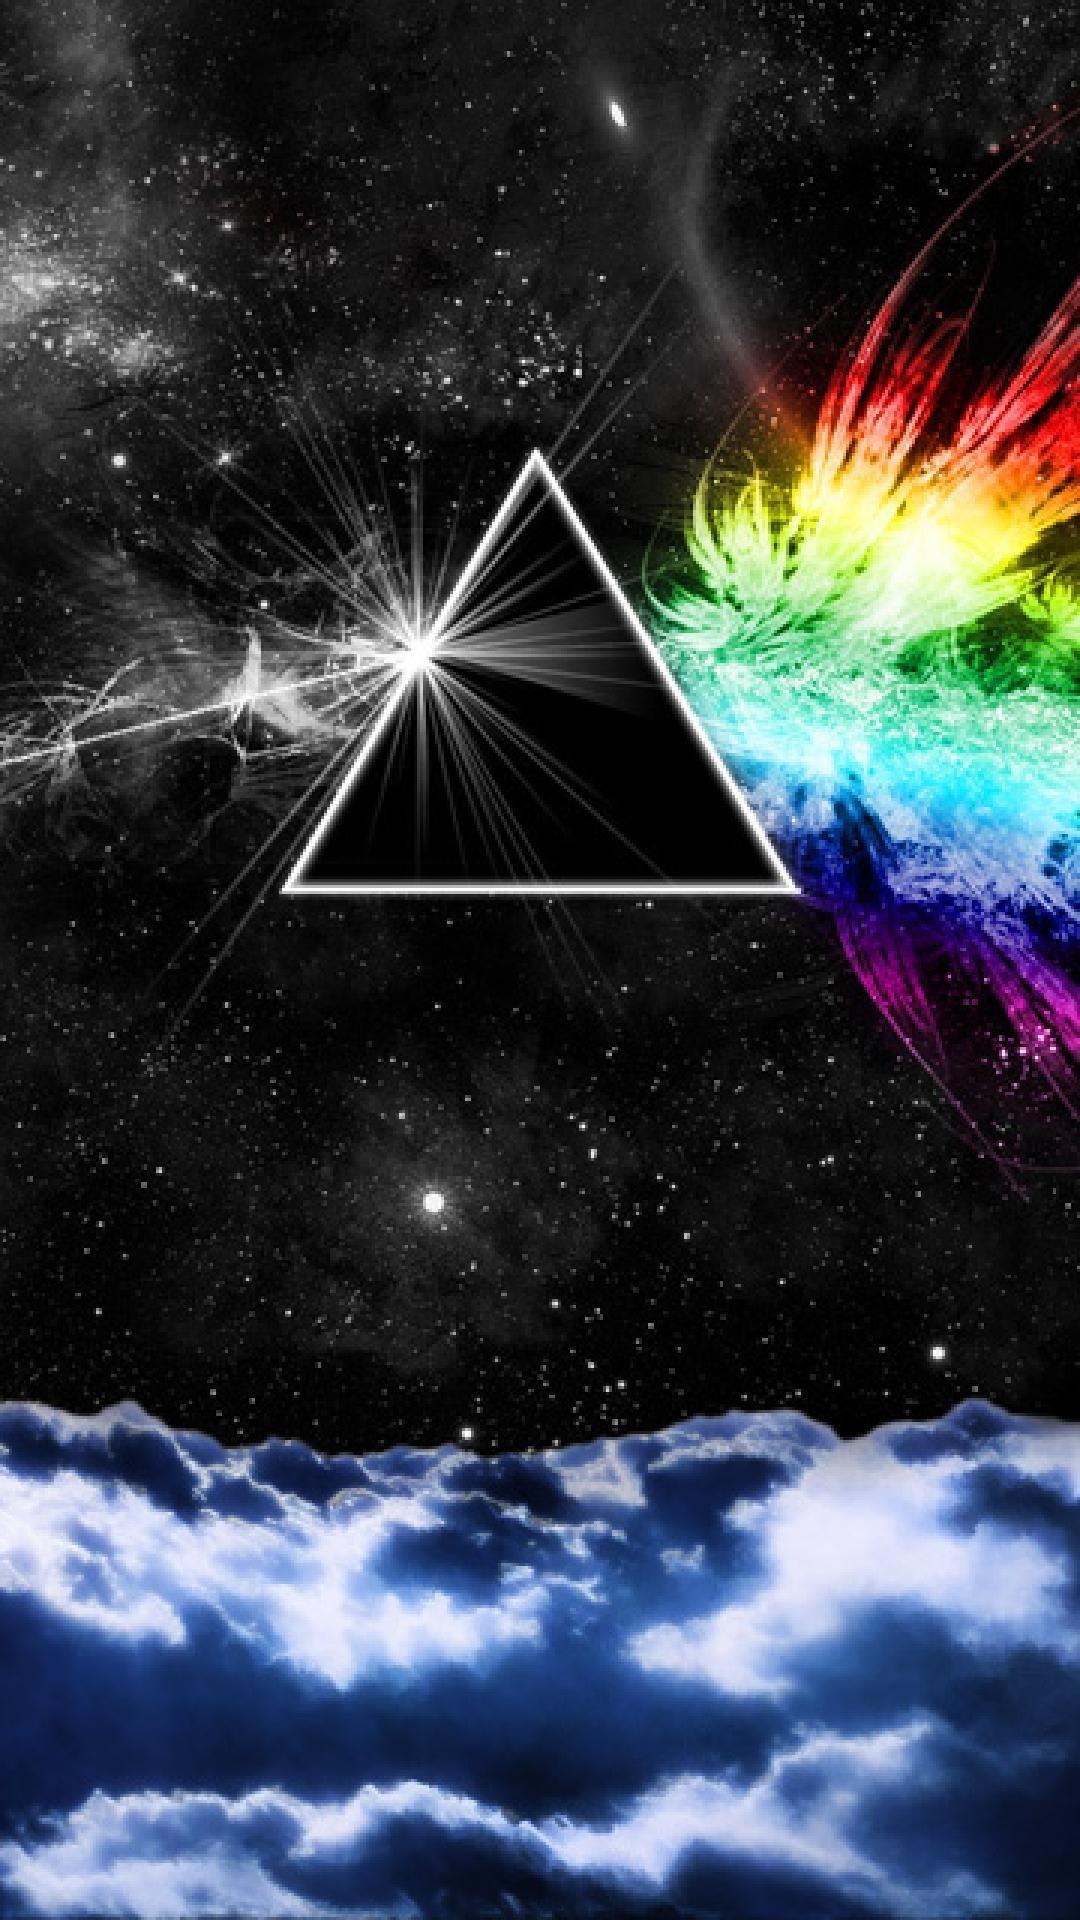 1920x1080 Pink Floyd Wish You Were Here Desktop Full HD Wallpaper